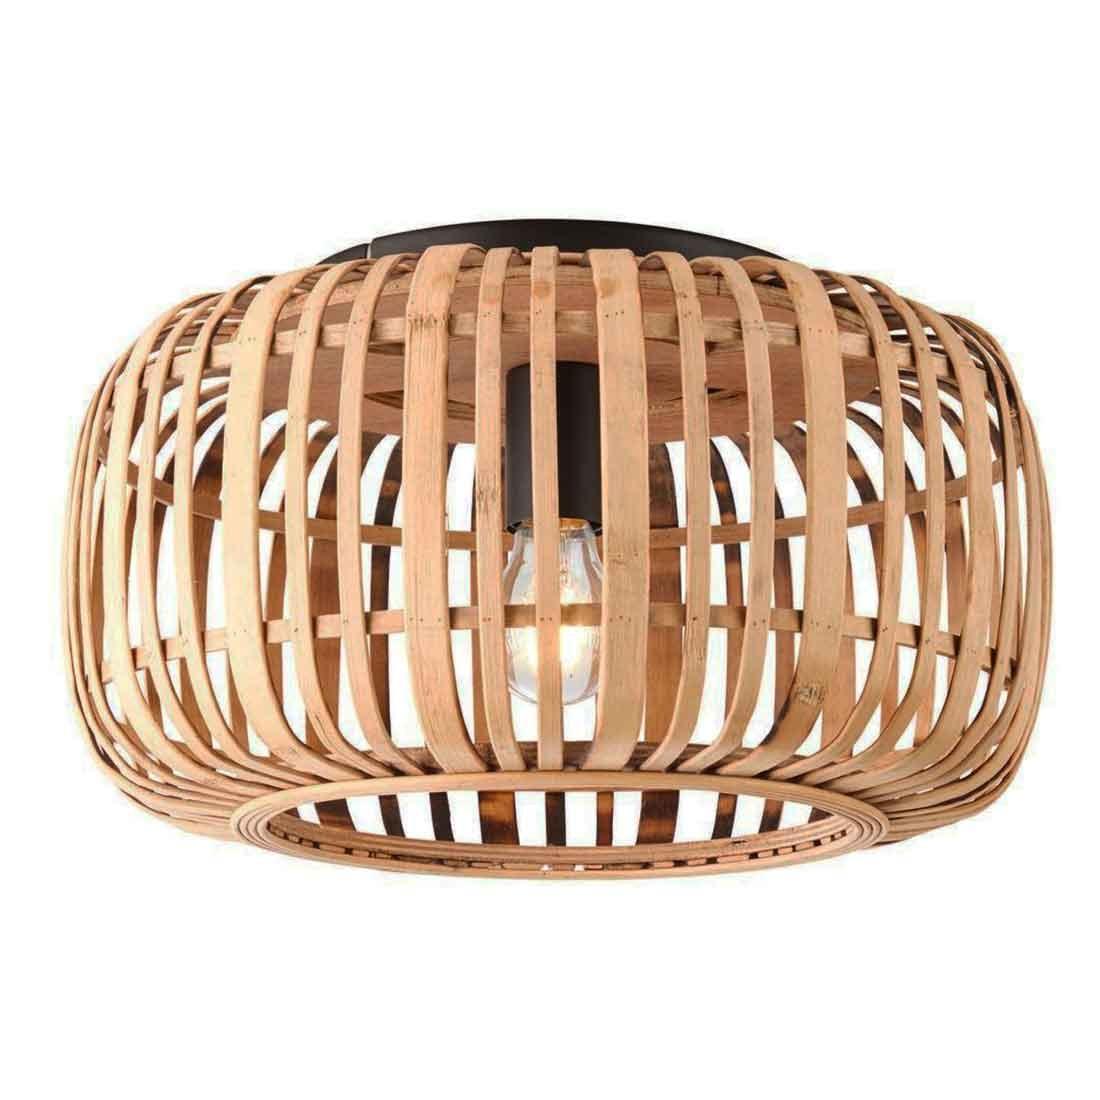 Freelight Plafondlamp Treccia Rotan Ø 40 cm beige zwart